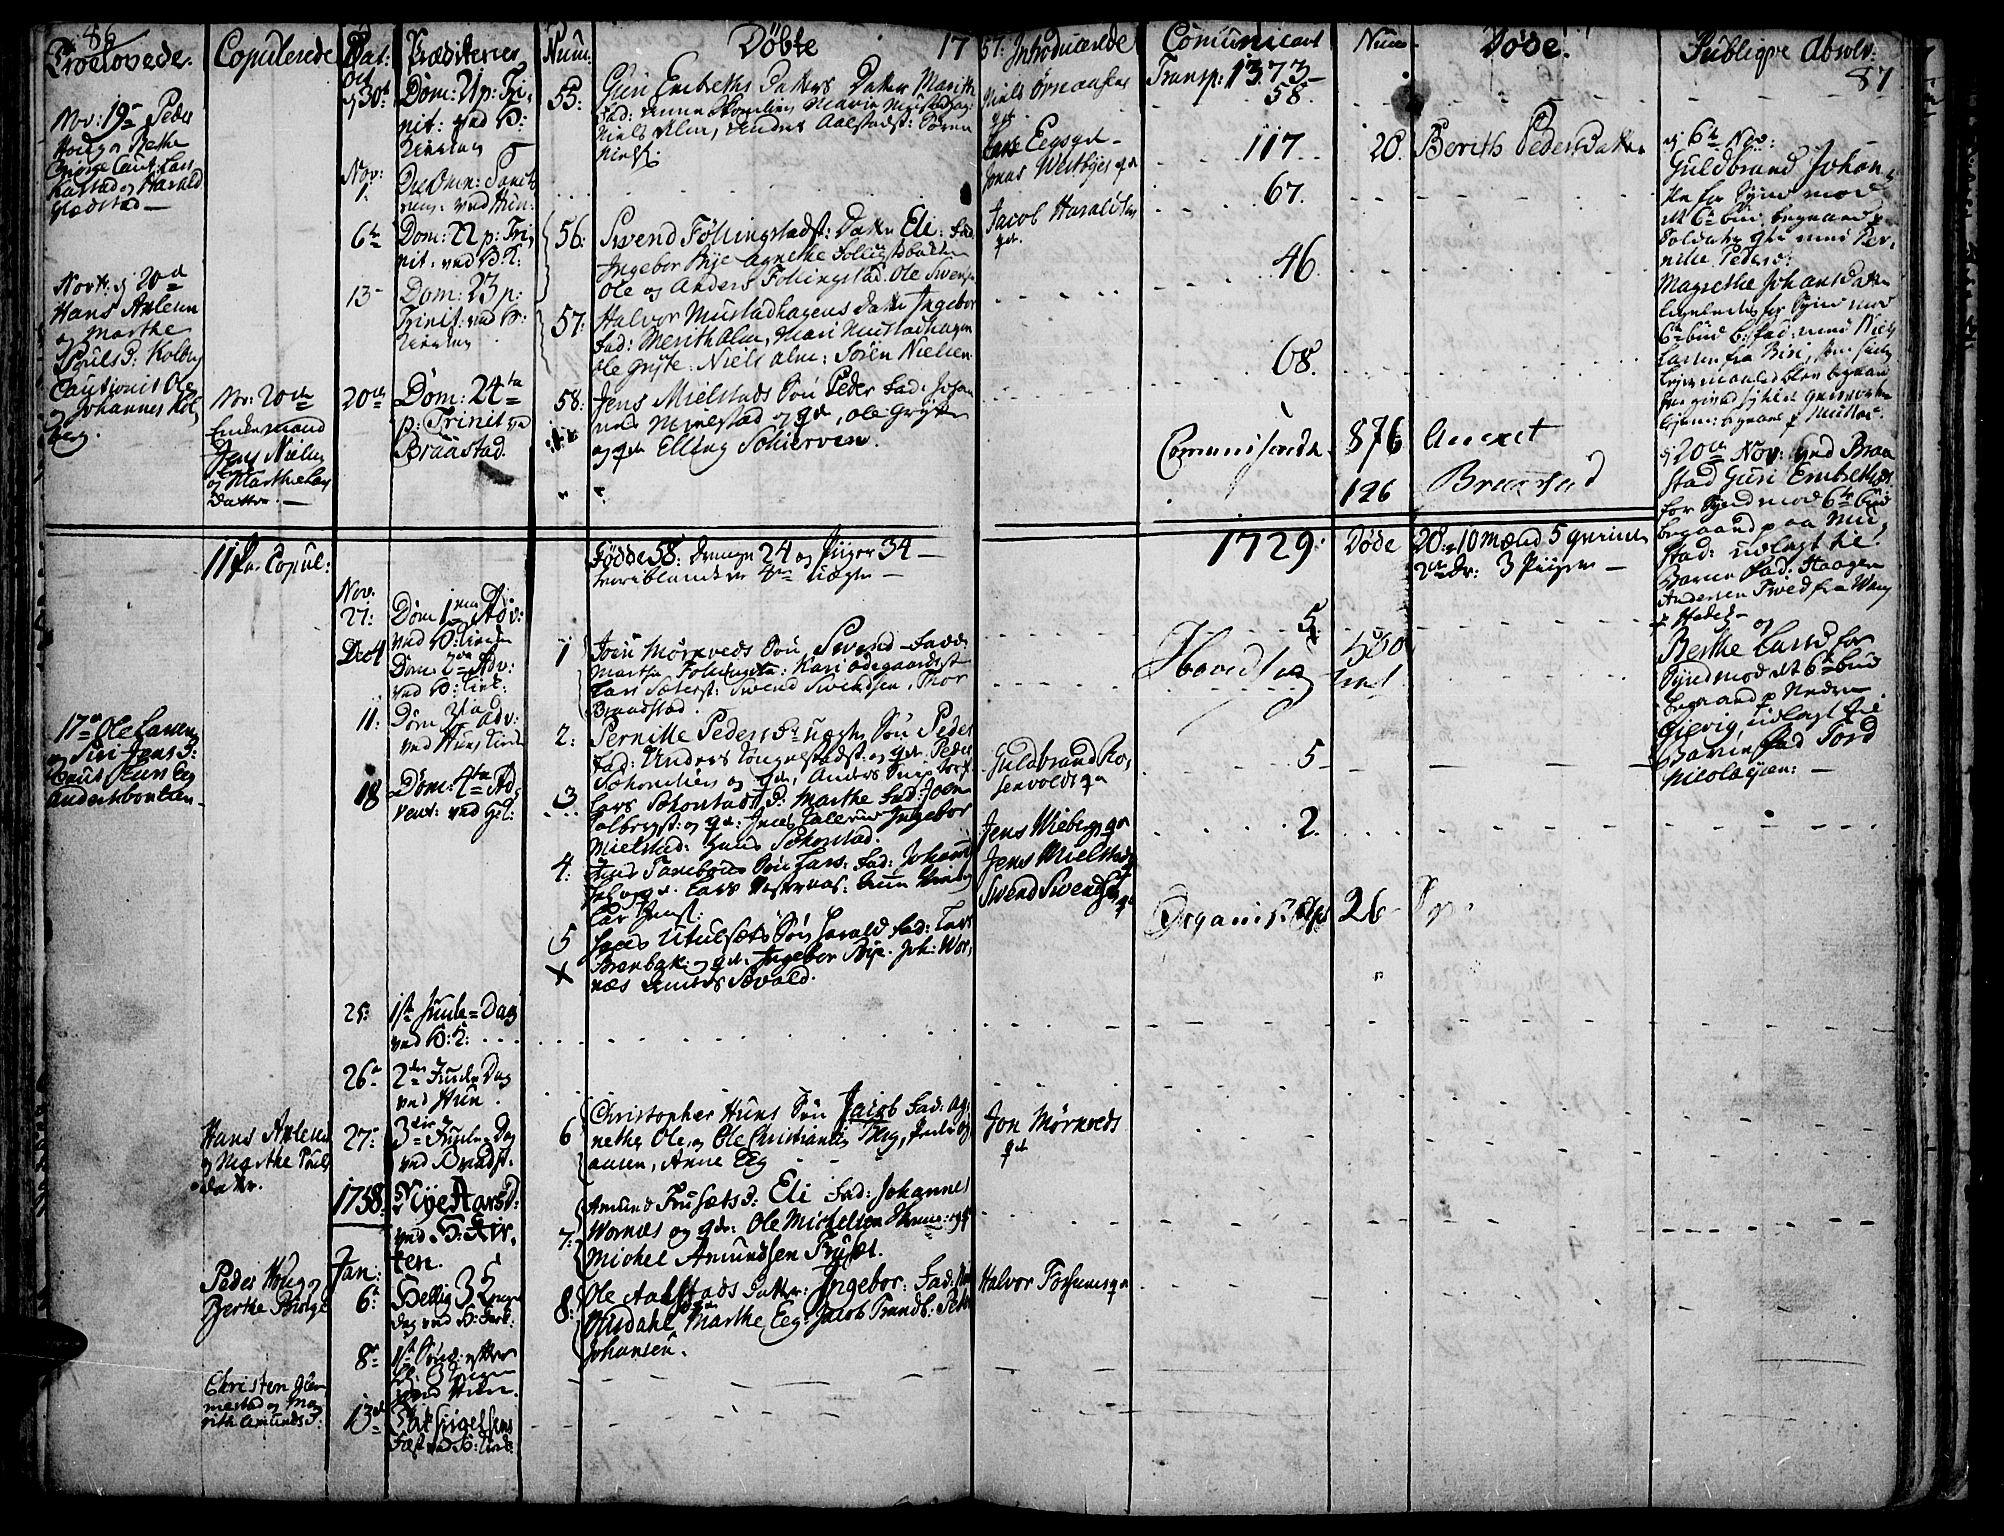 SAH, Vardal prestekontor, H/Ha/Haa/L0002: Ministerialbok nr. 2, 1748-1776, s. 86-87